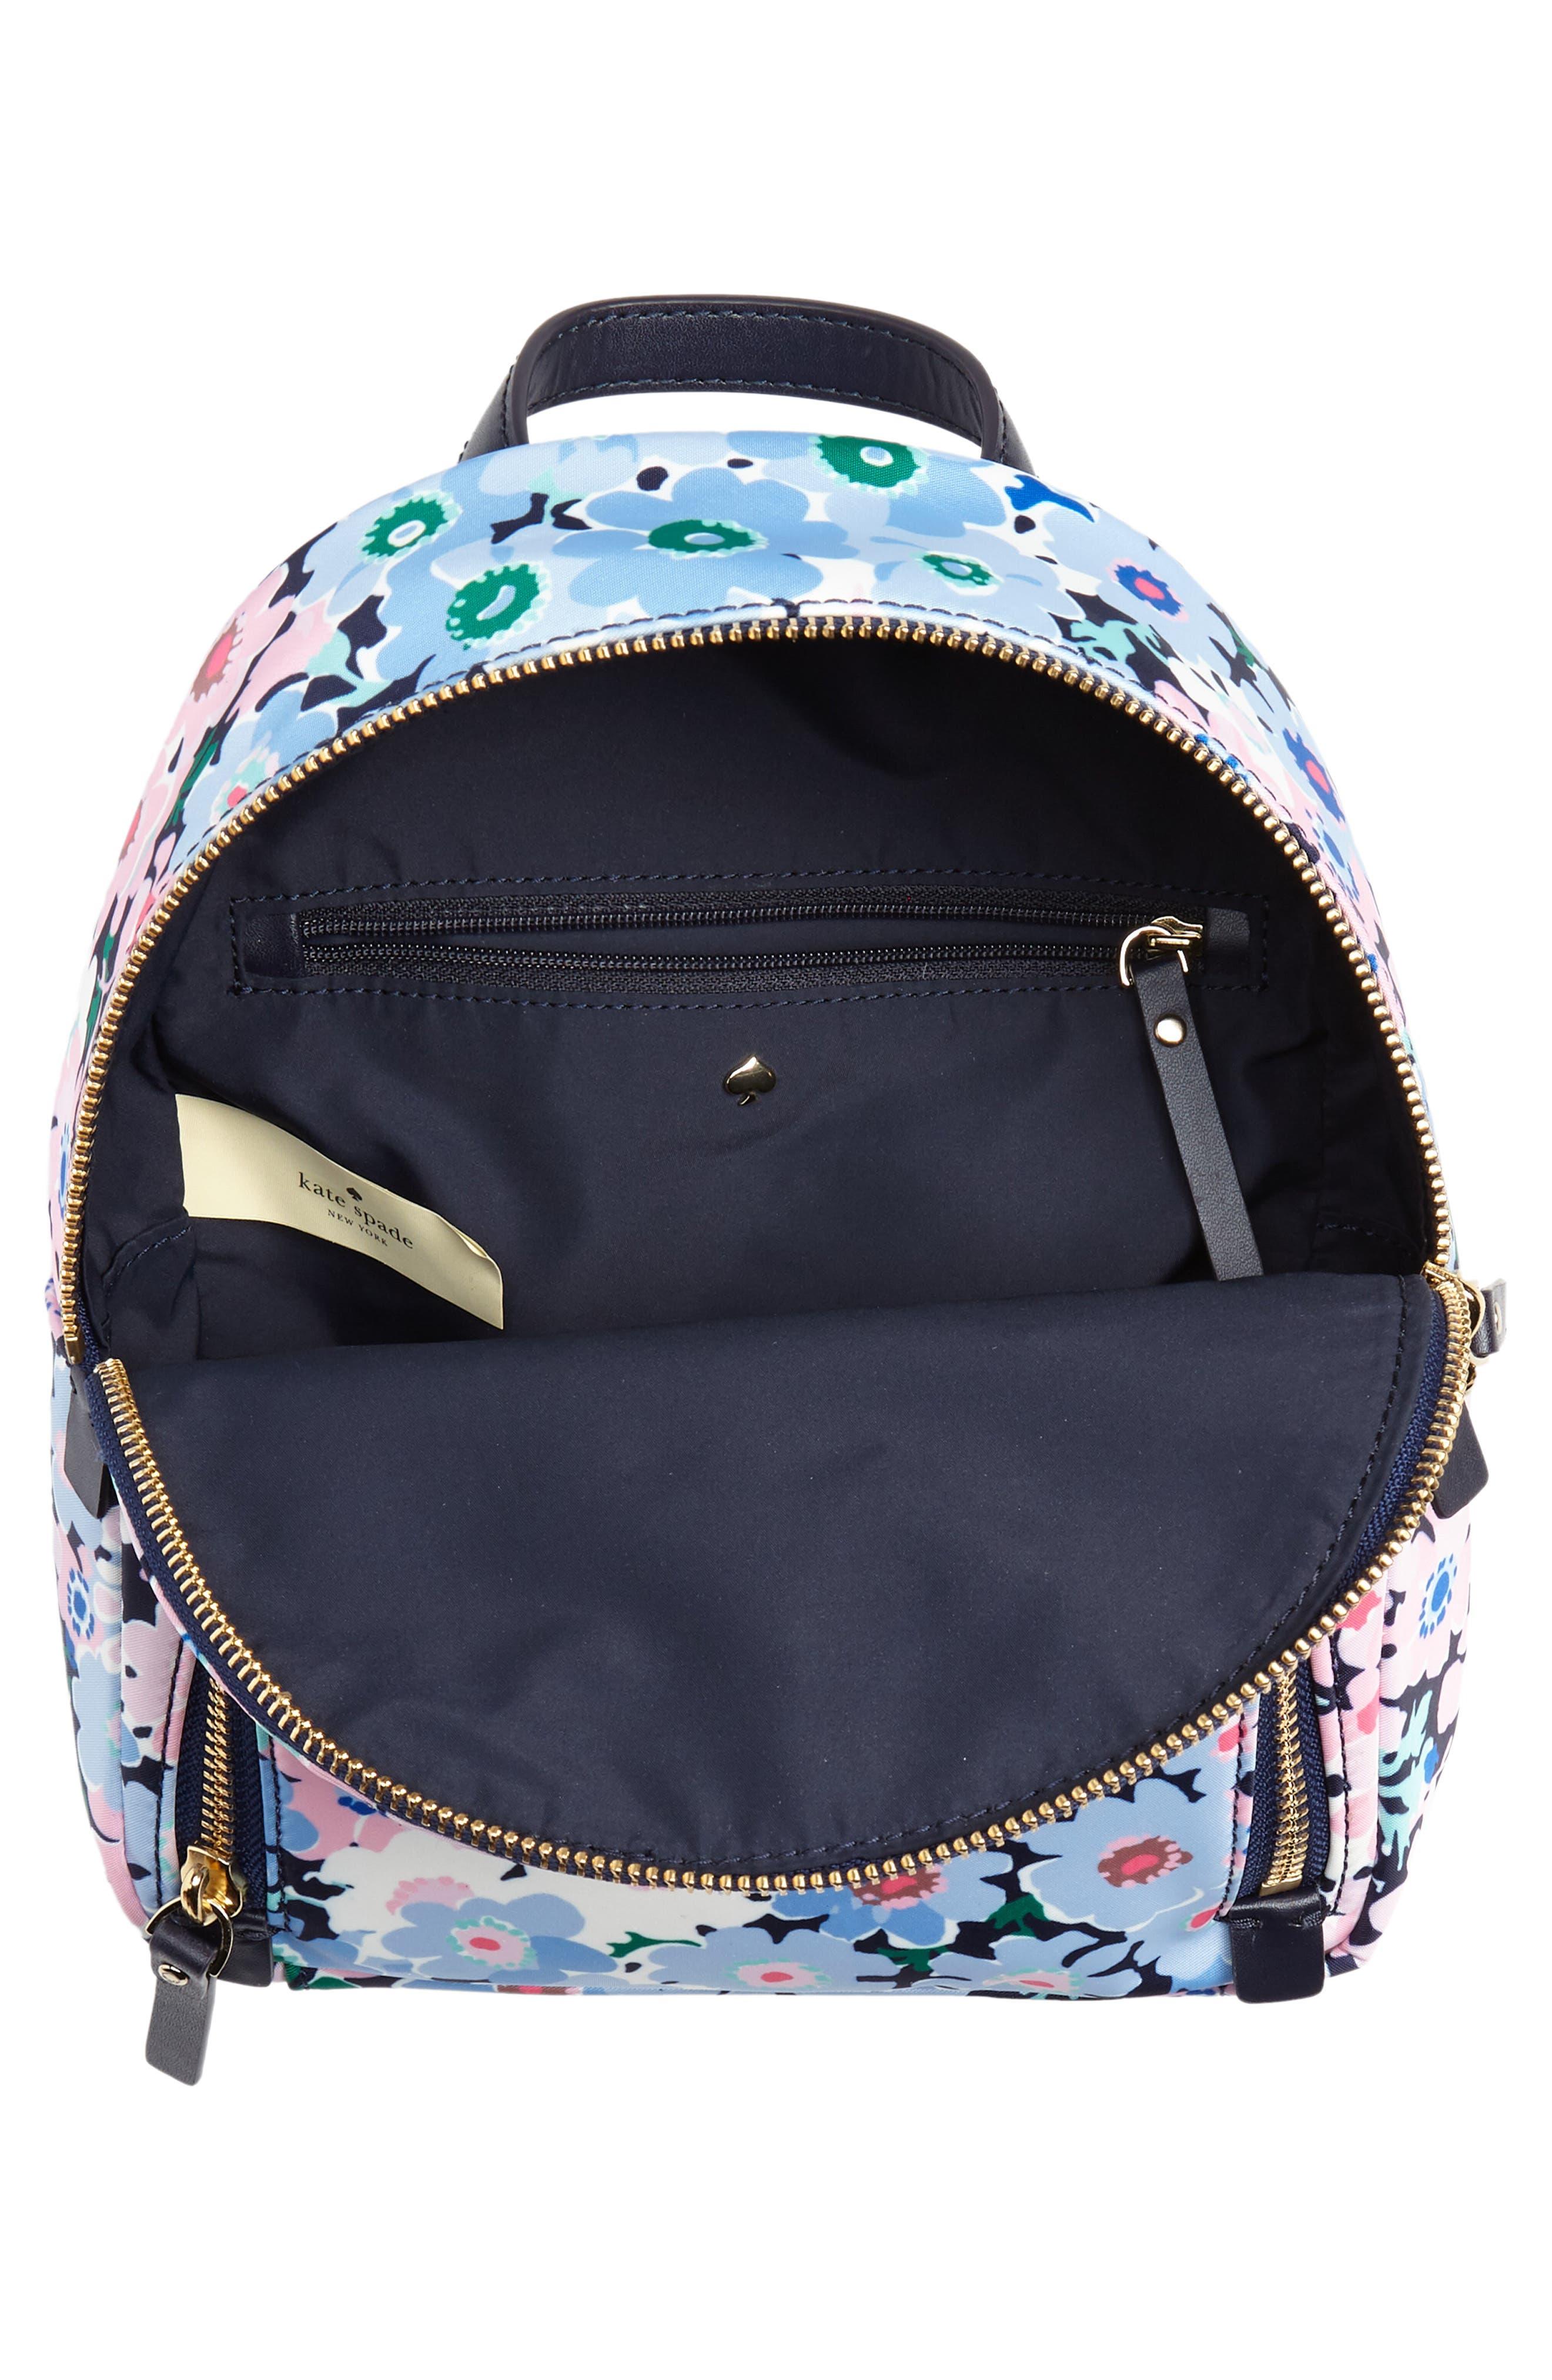 watson lane - daisy garden small hartley backpack,                             Alternate thumbnail 4, color,                             Blue Multi